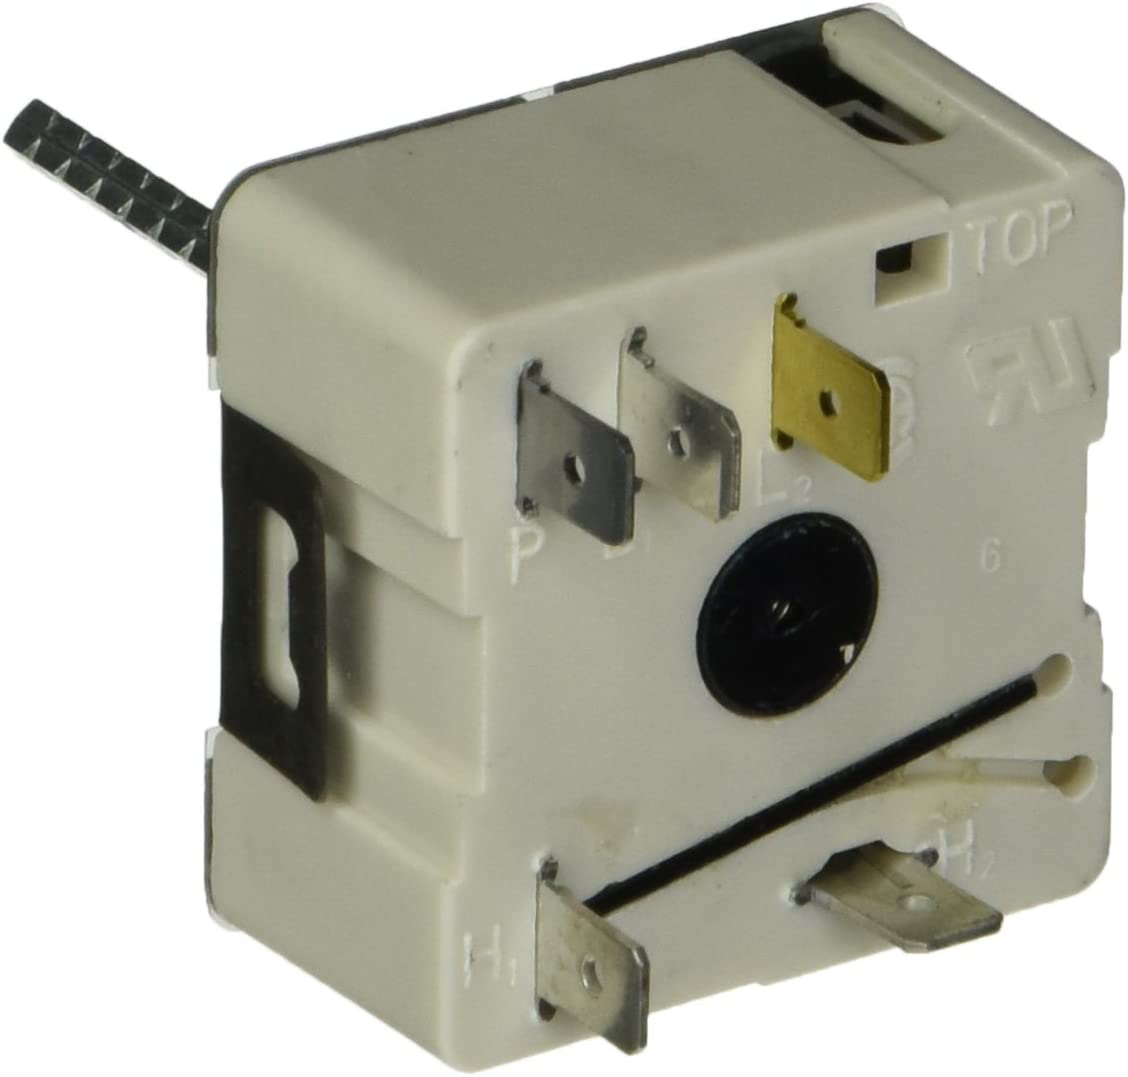 Robertshaw 5500-200 Uni-Kit Universal Electric Range Infinite Switch, Push To Turn